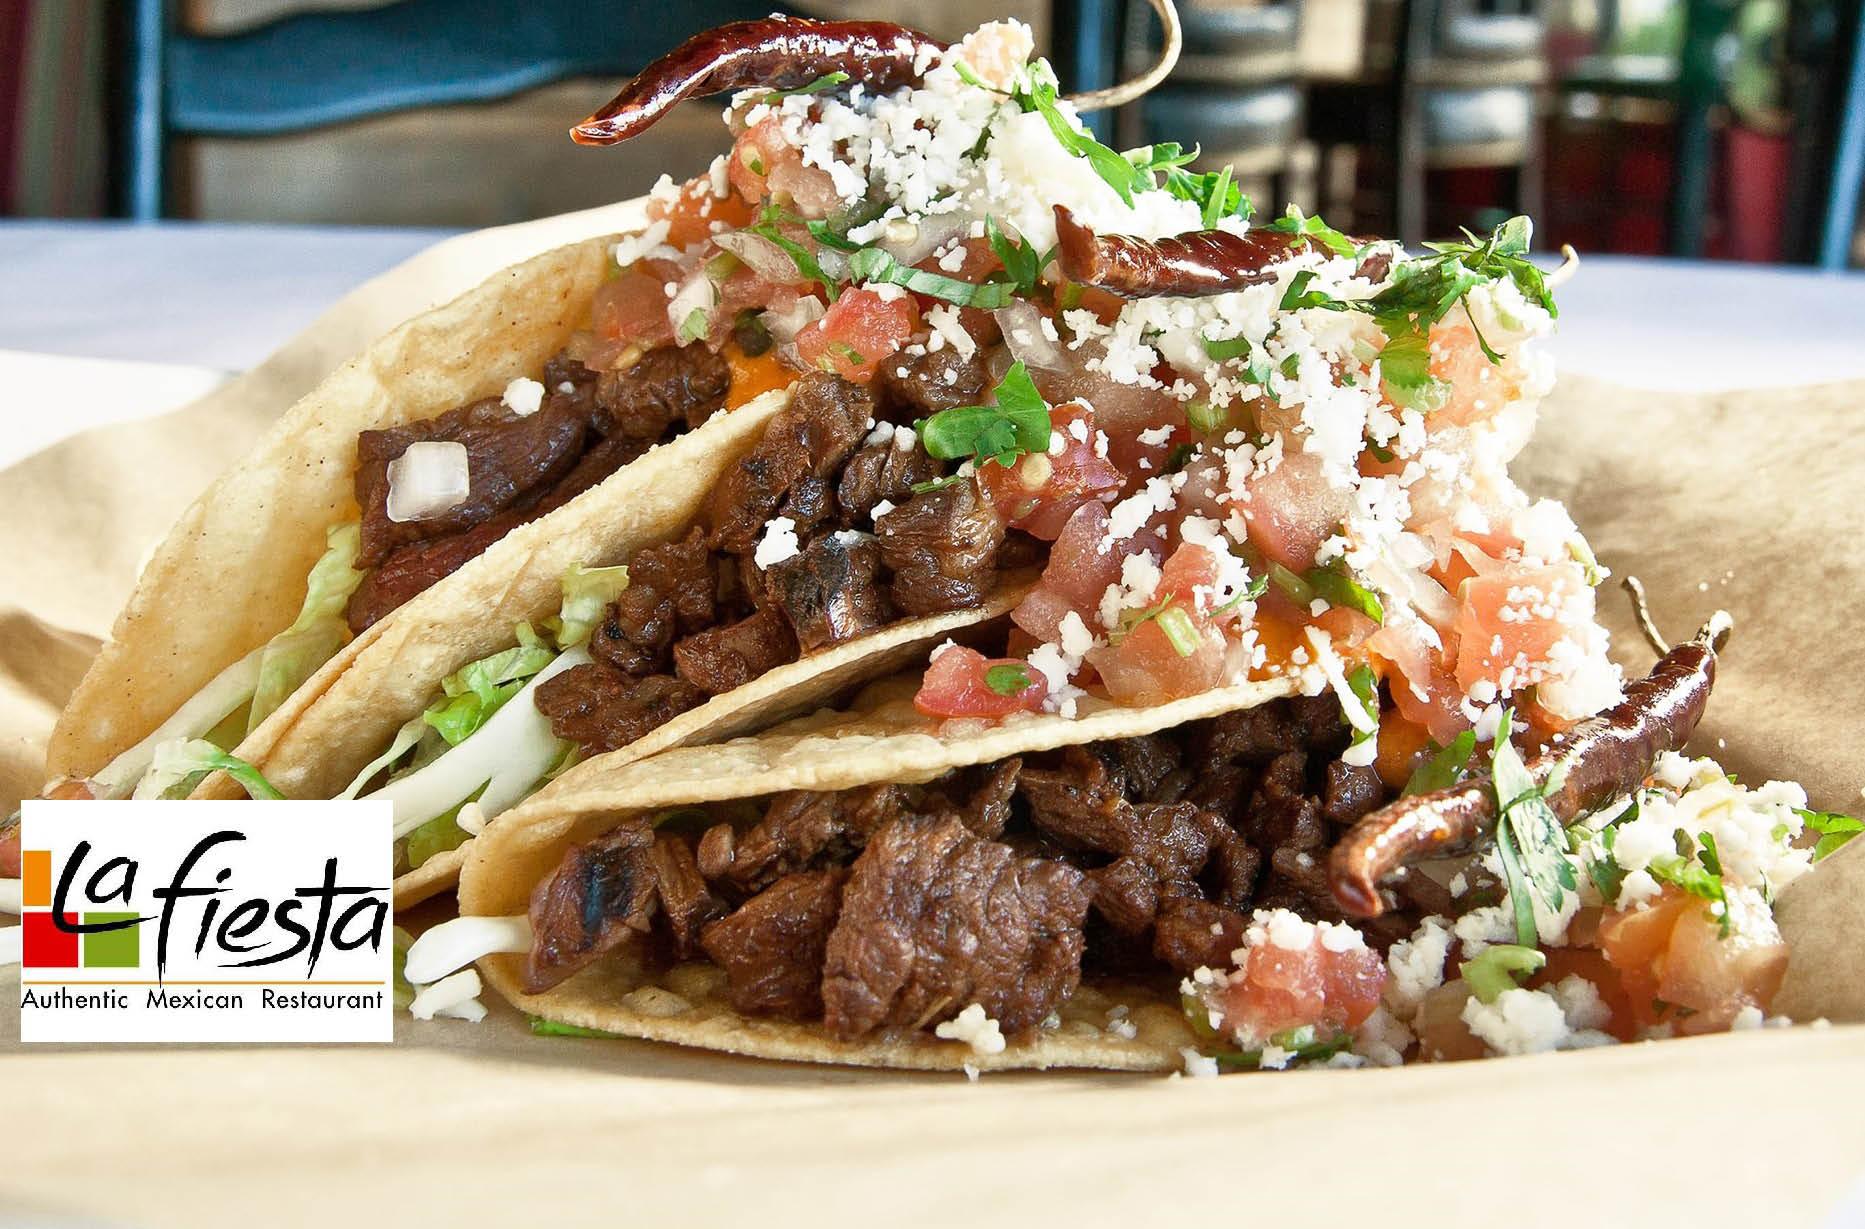 La Fiesta Ormond Beach & Port Orange Authentic Mexican Restaurant Food.